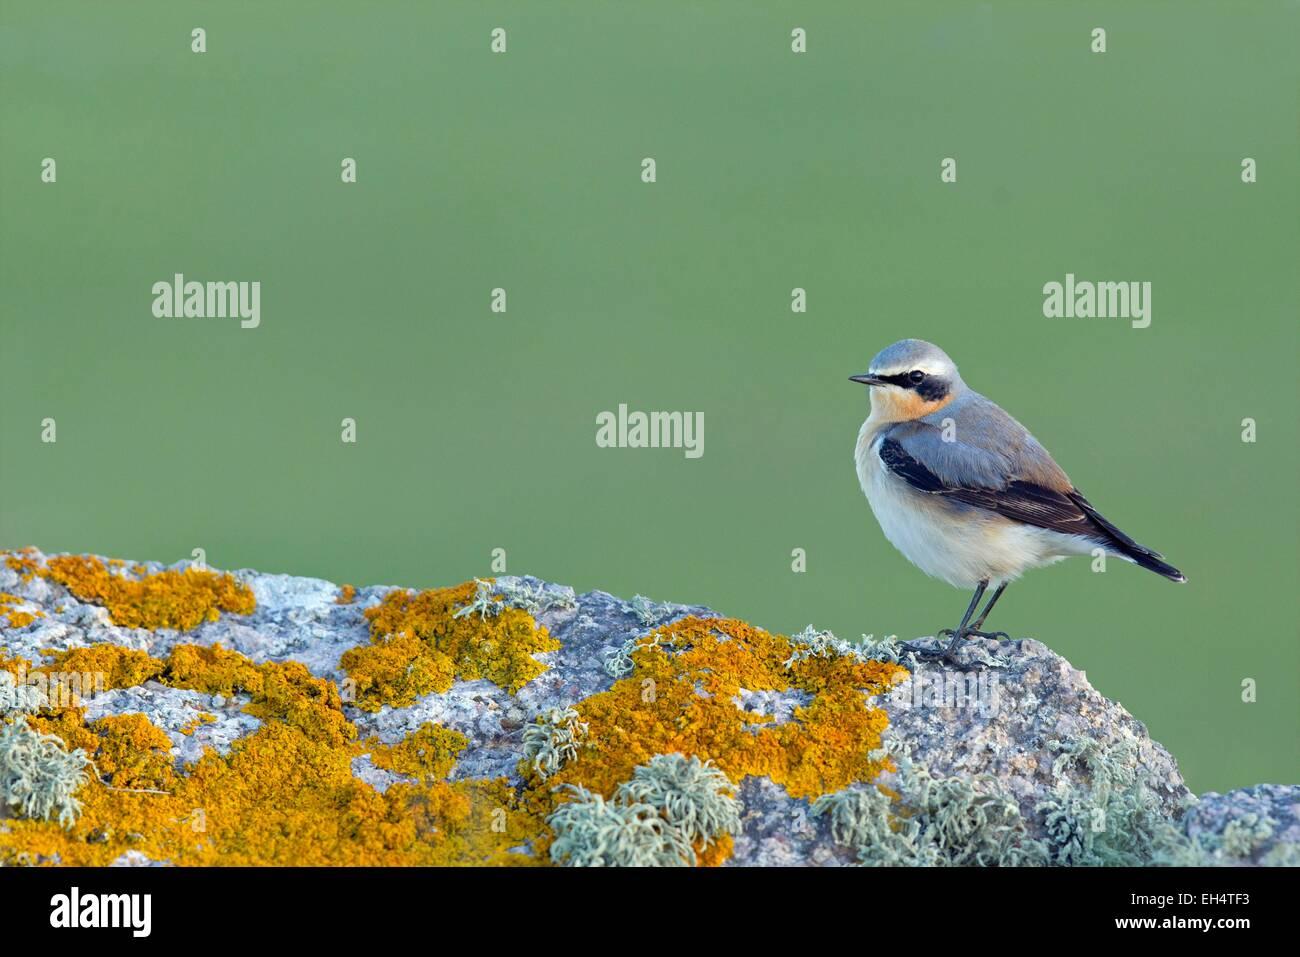 France, Manche, Wheatear, (Oenanthe oenanthe) - Stock Image